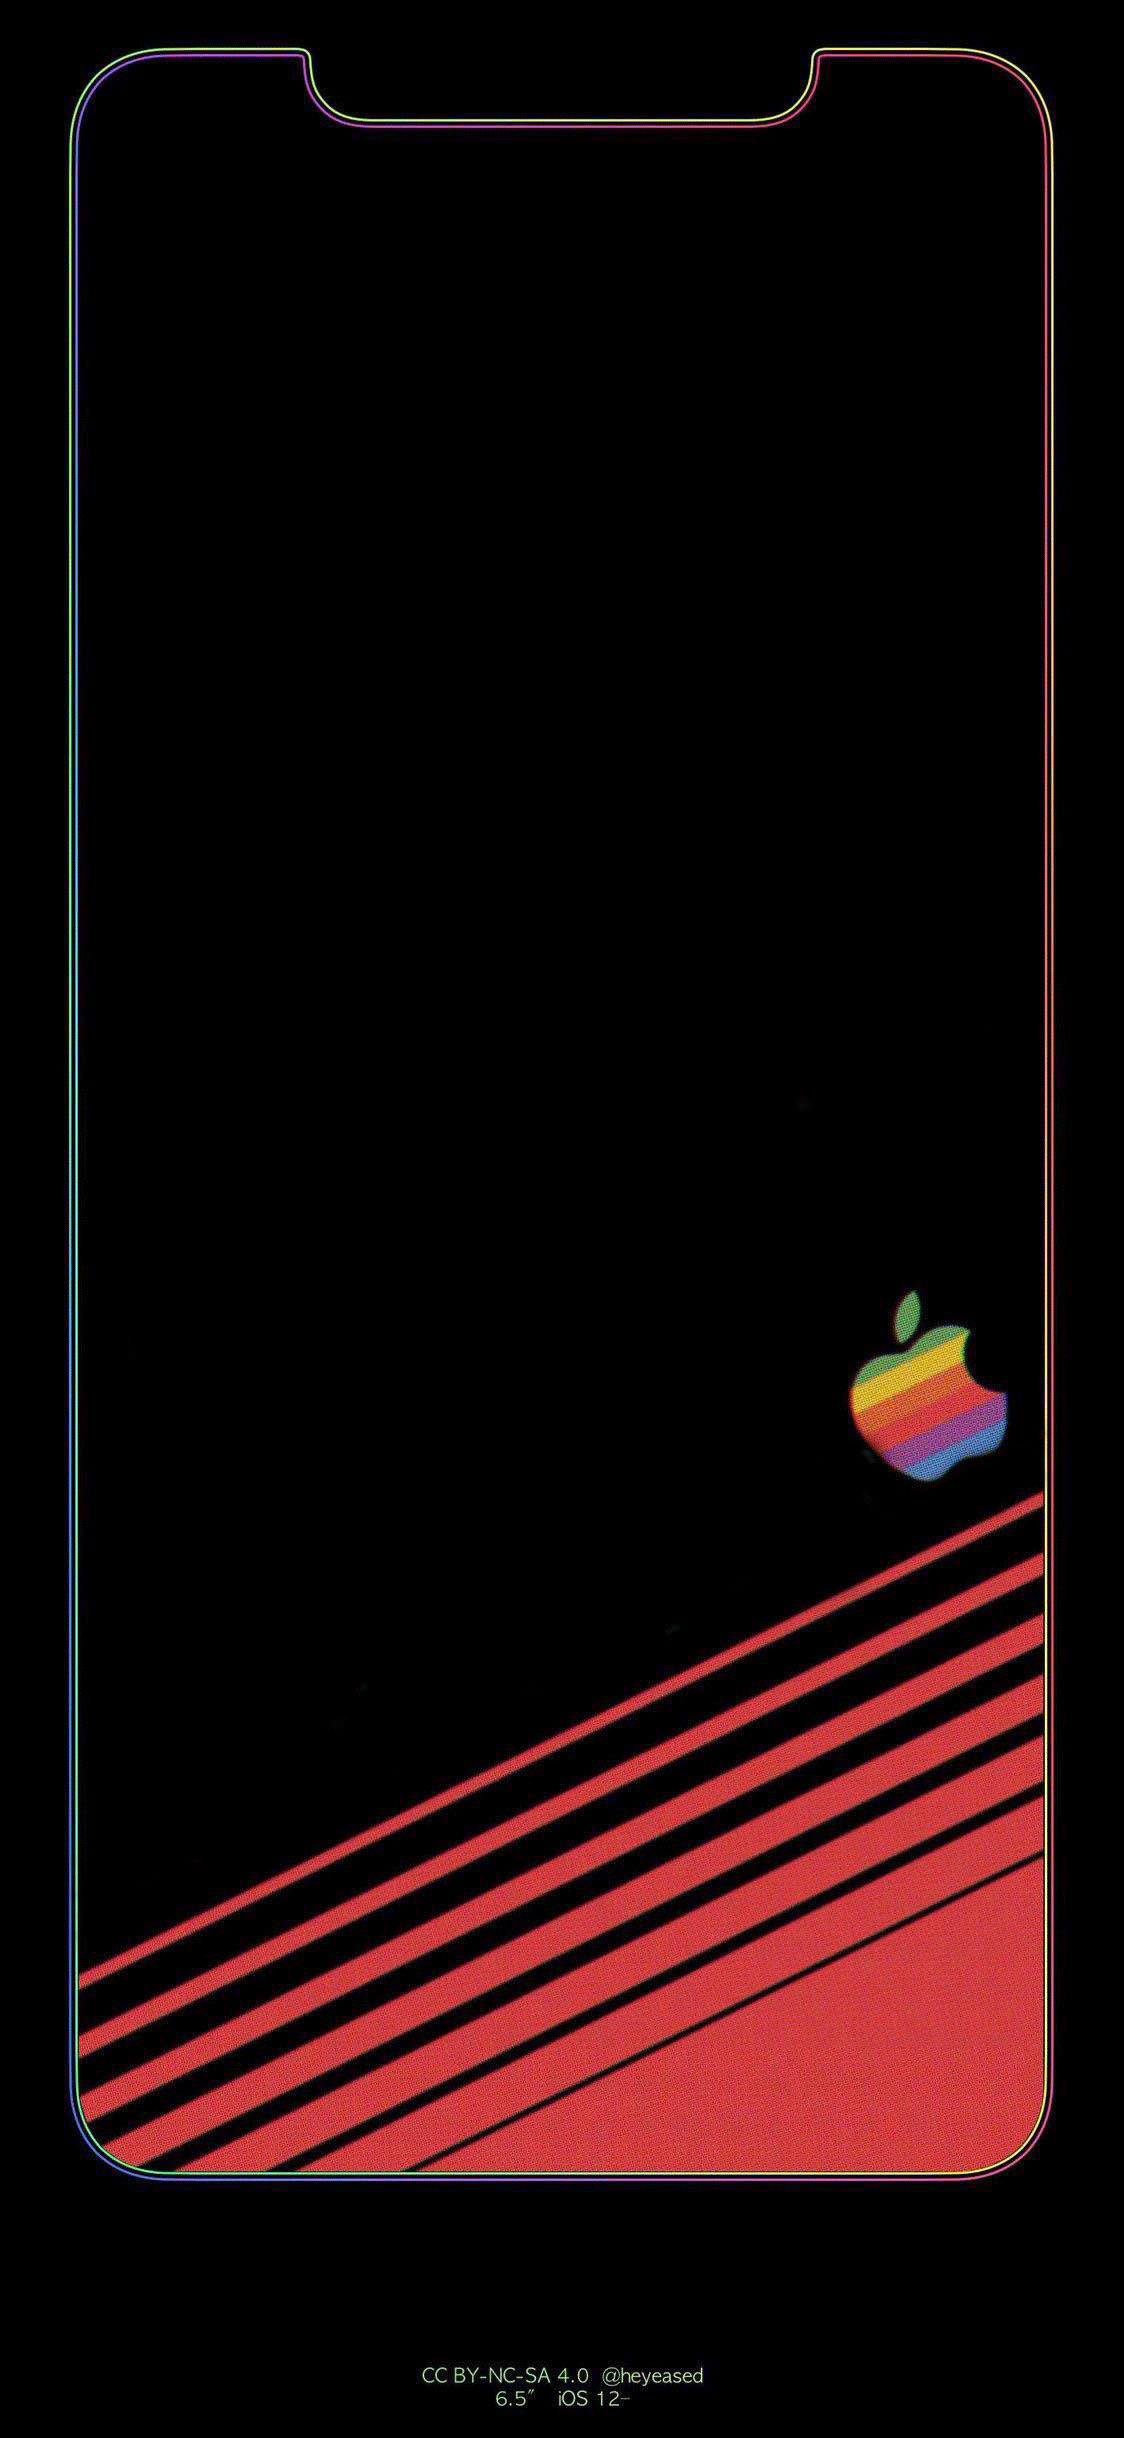 Fun Retro Iphone Wallpaper , Iphone Xs Max Wallpaper With